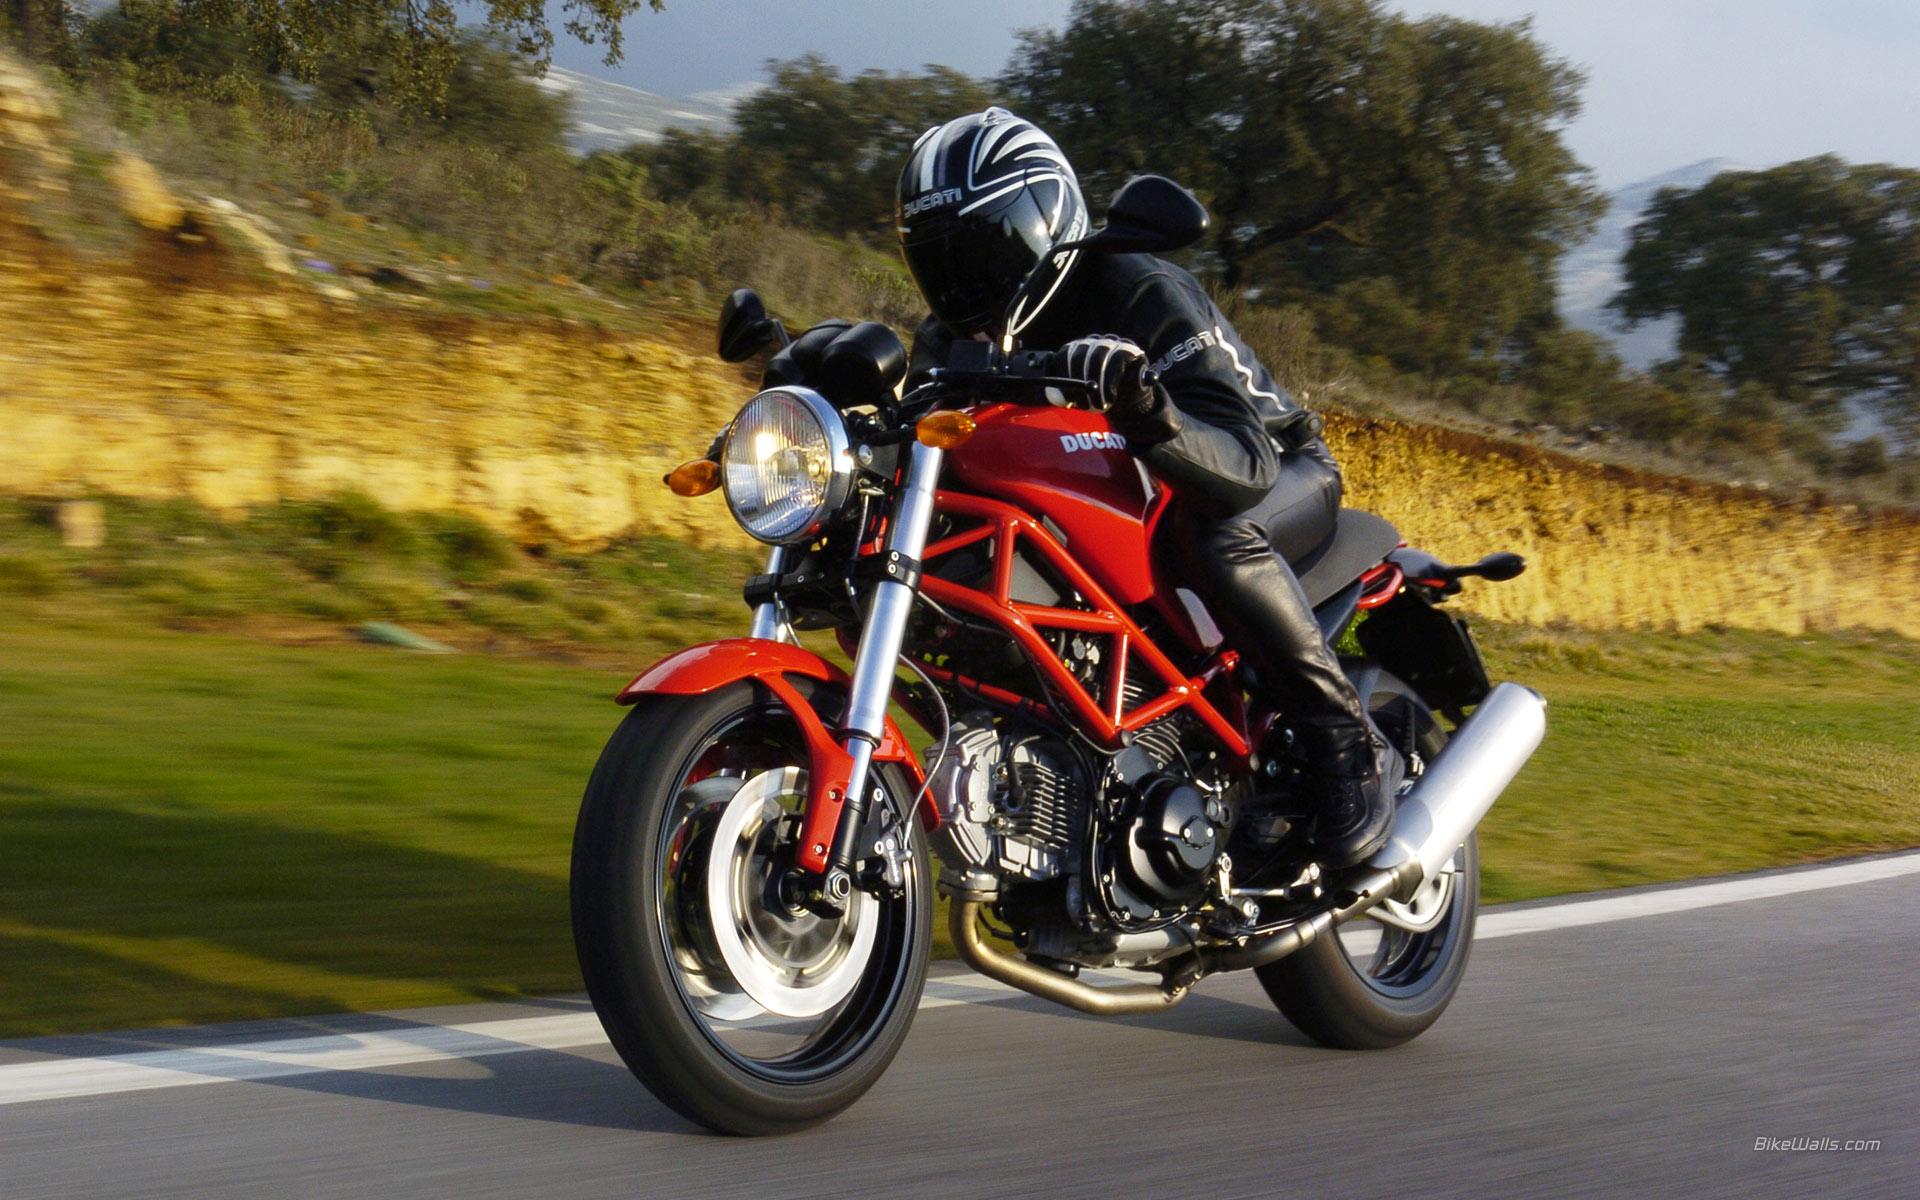 Ducati 1098 Racing Motorcycle Stunt Performer Ducati